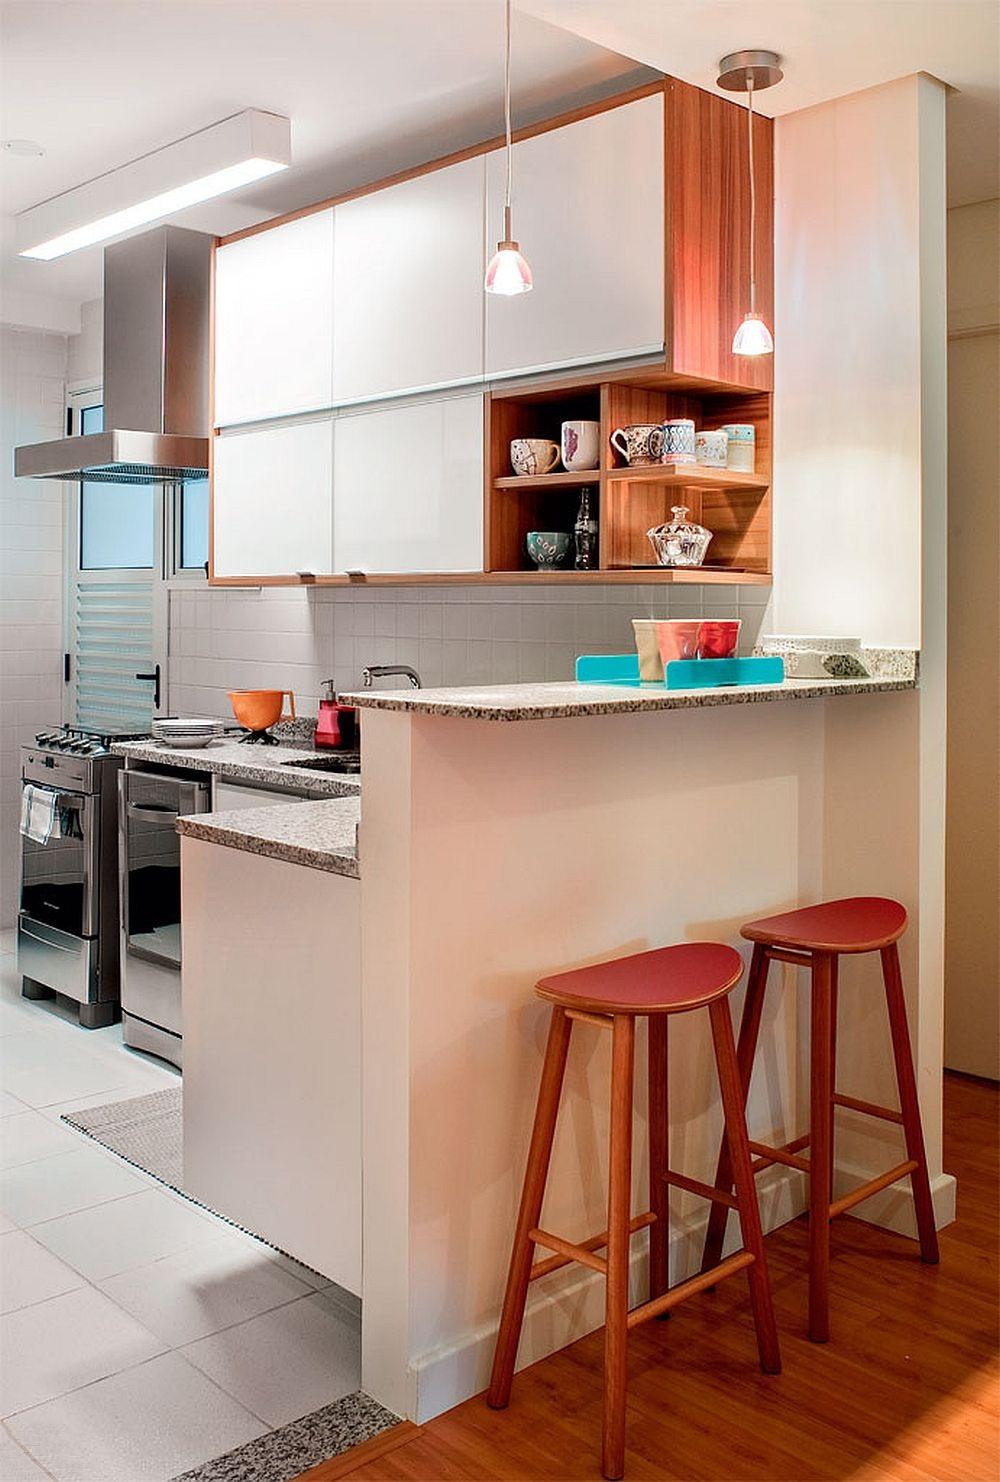 adelaparvu.com despre apartament de trei camere cu gratar pe balcon, designer Daniela Berardinelli (6)